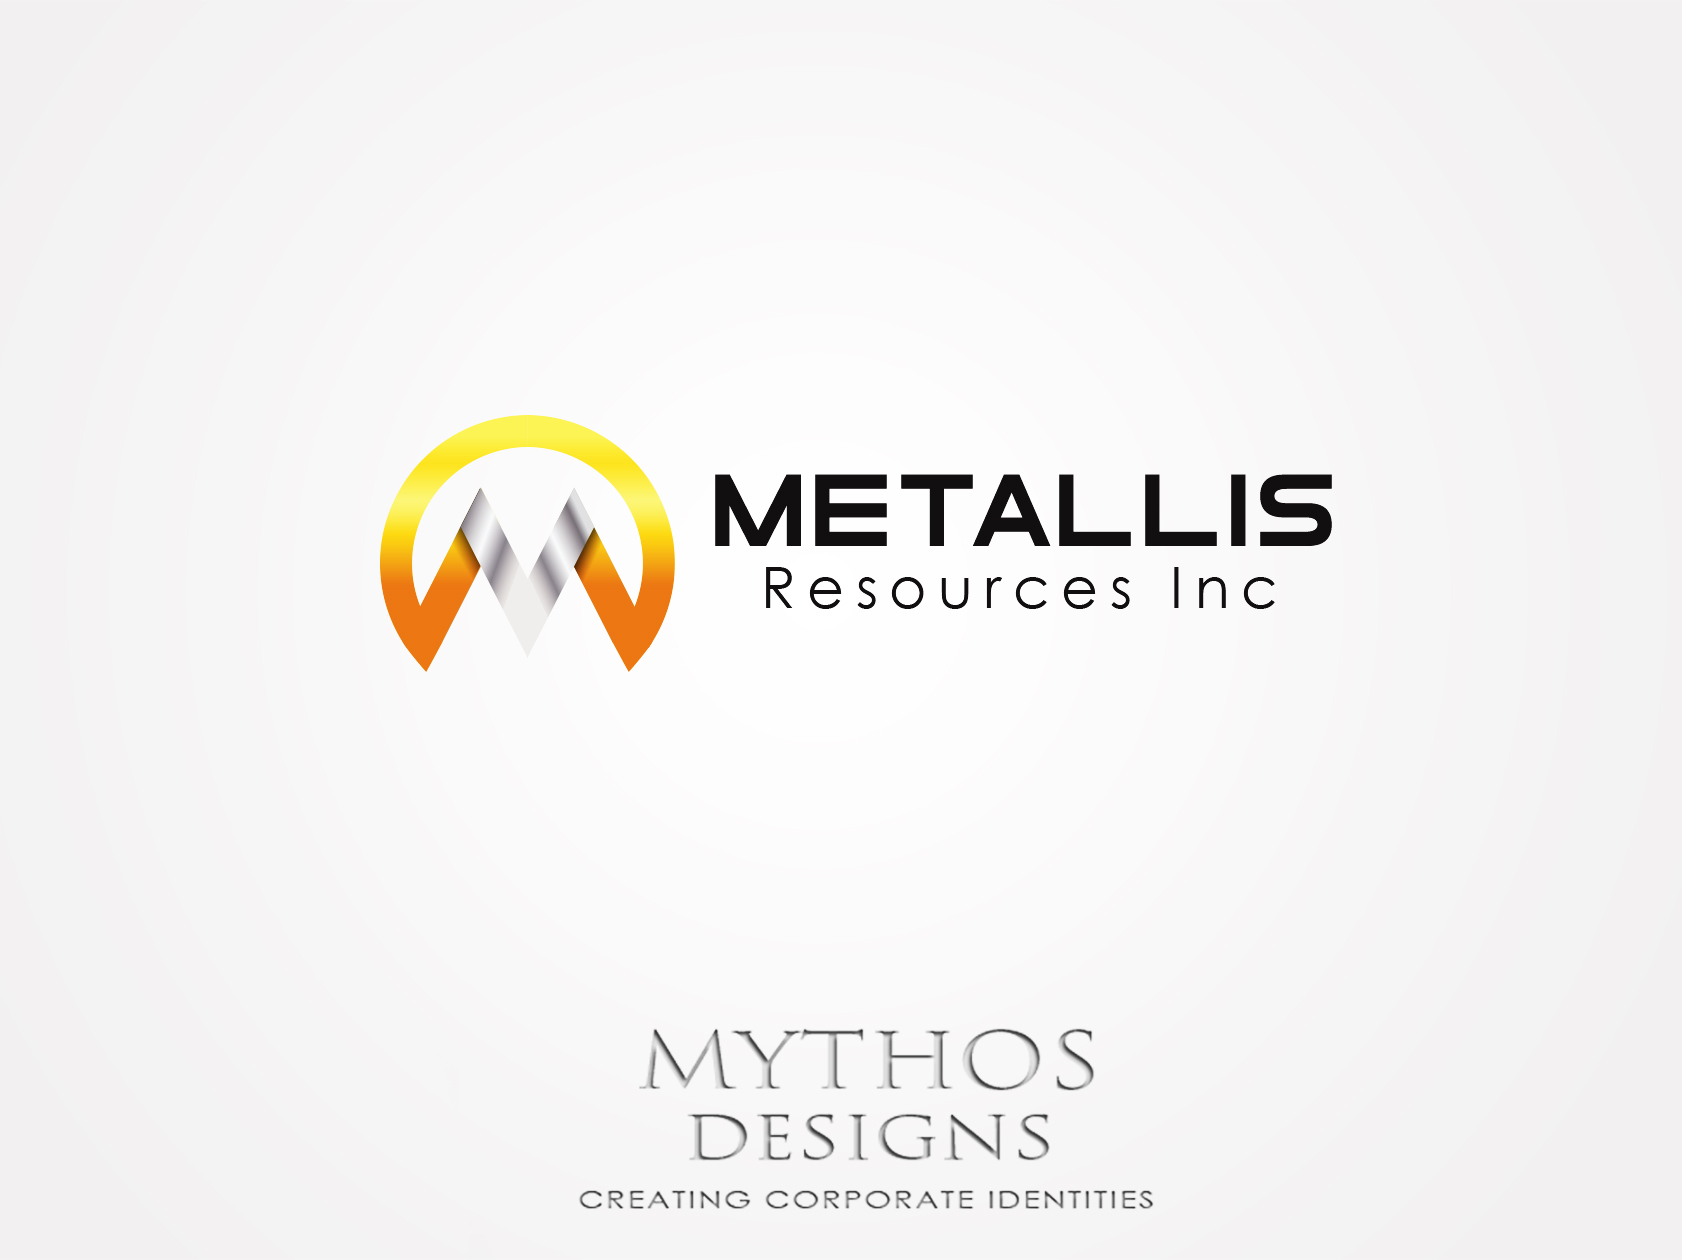 Logo Design by Mythos Designs - Entry No. 31 in the Logo Design Contest Metallis Resources Inc Logo Design.